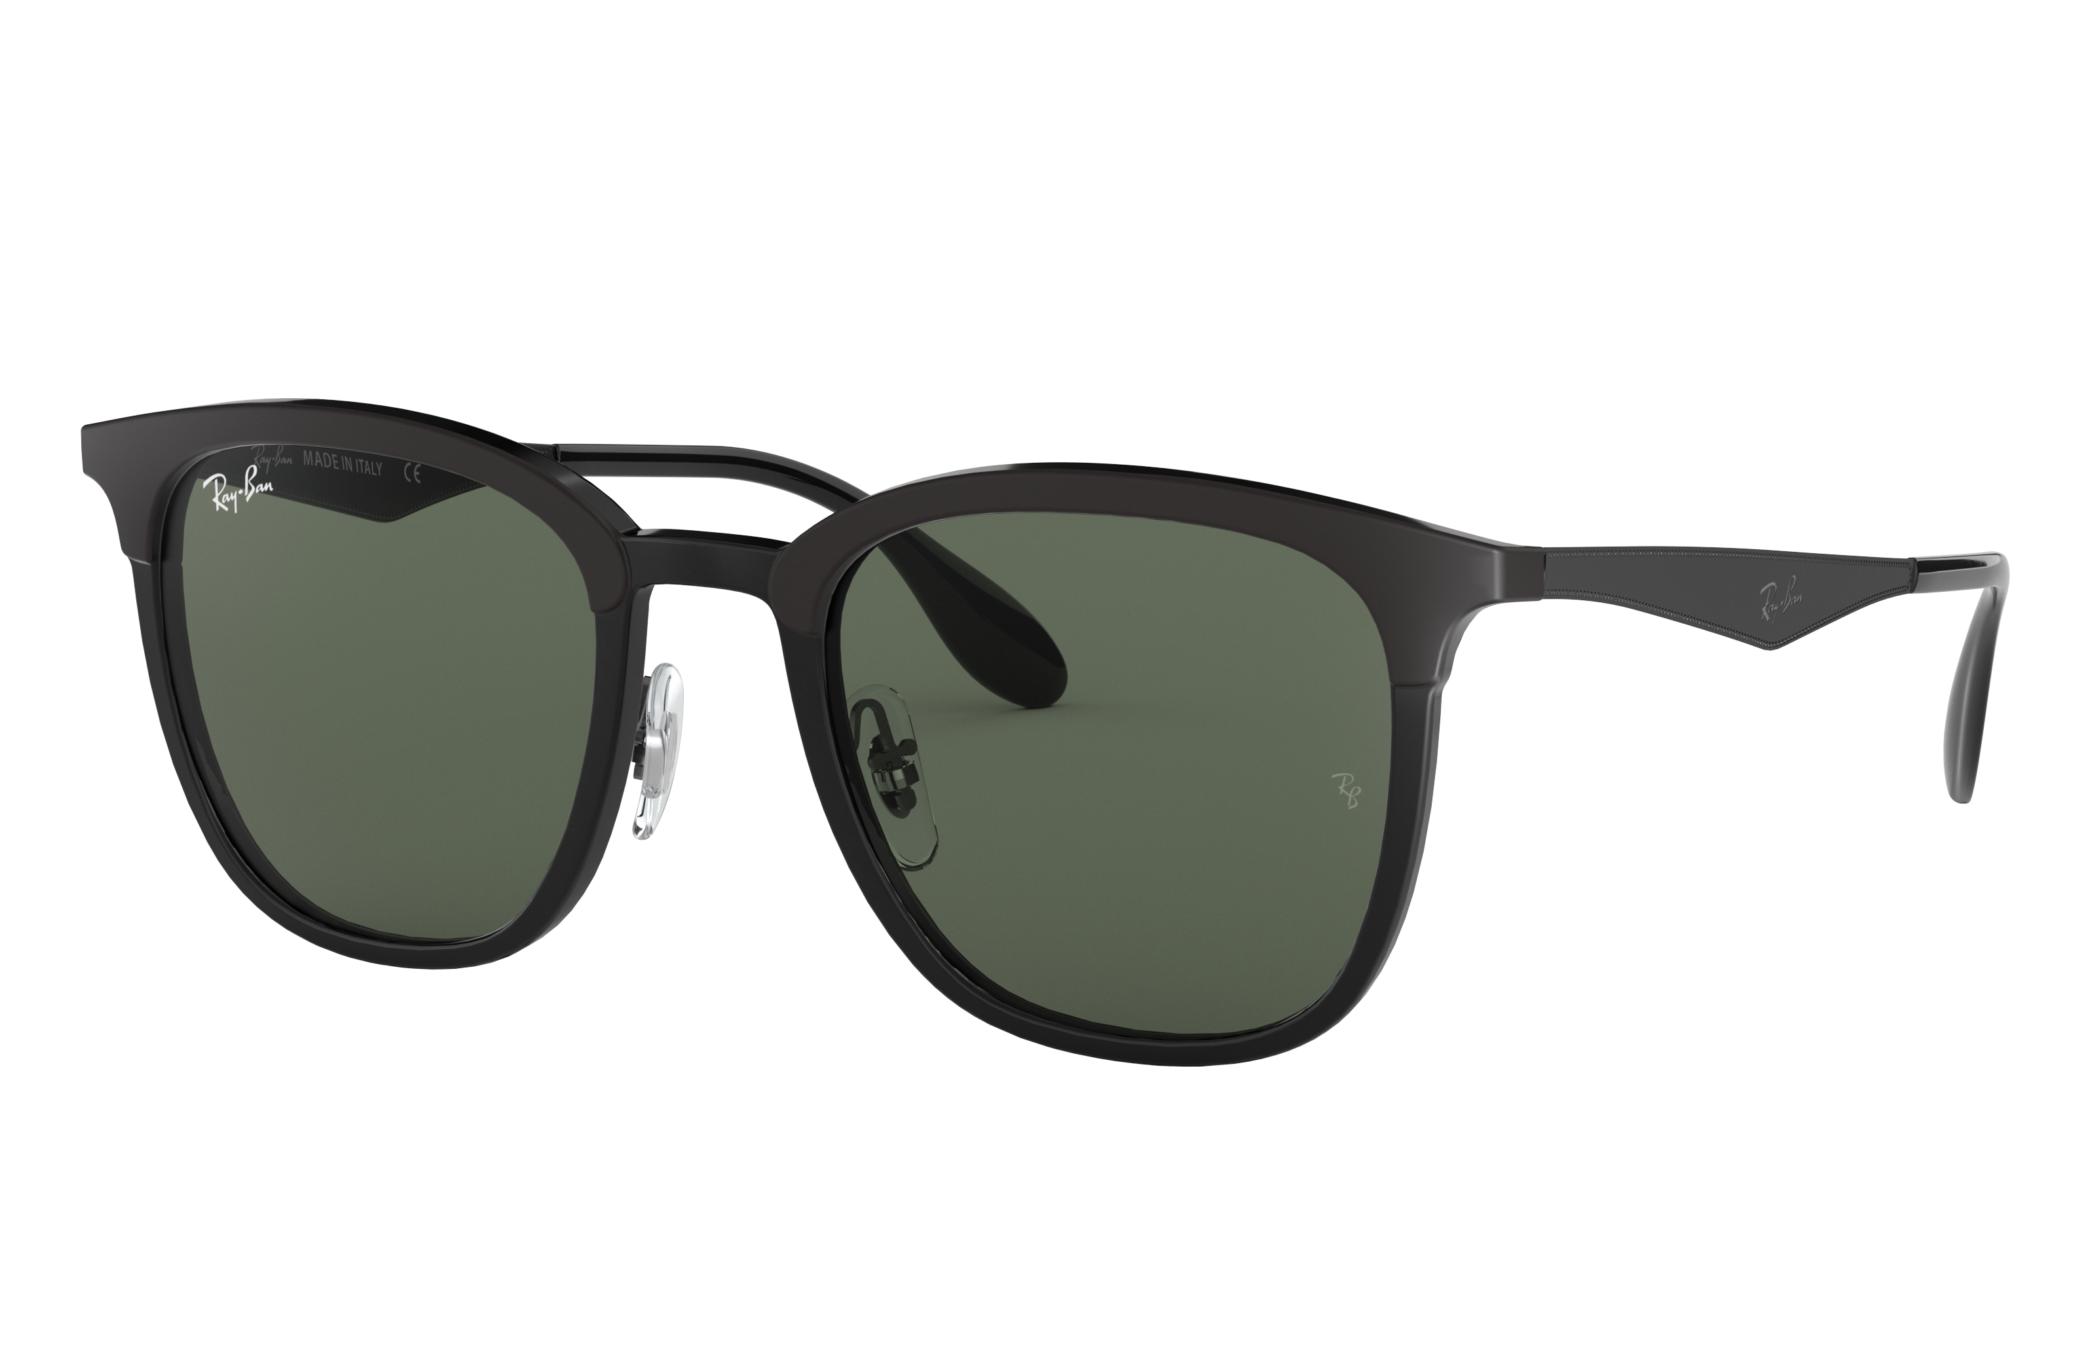 Ray-Ban Rb4278 Black, Green Lenses - RB4278